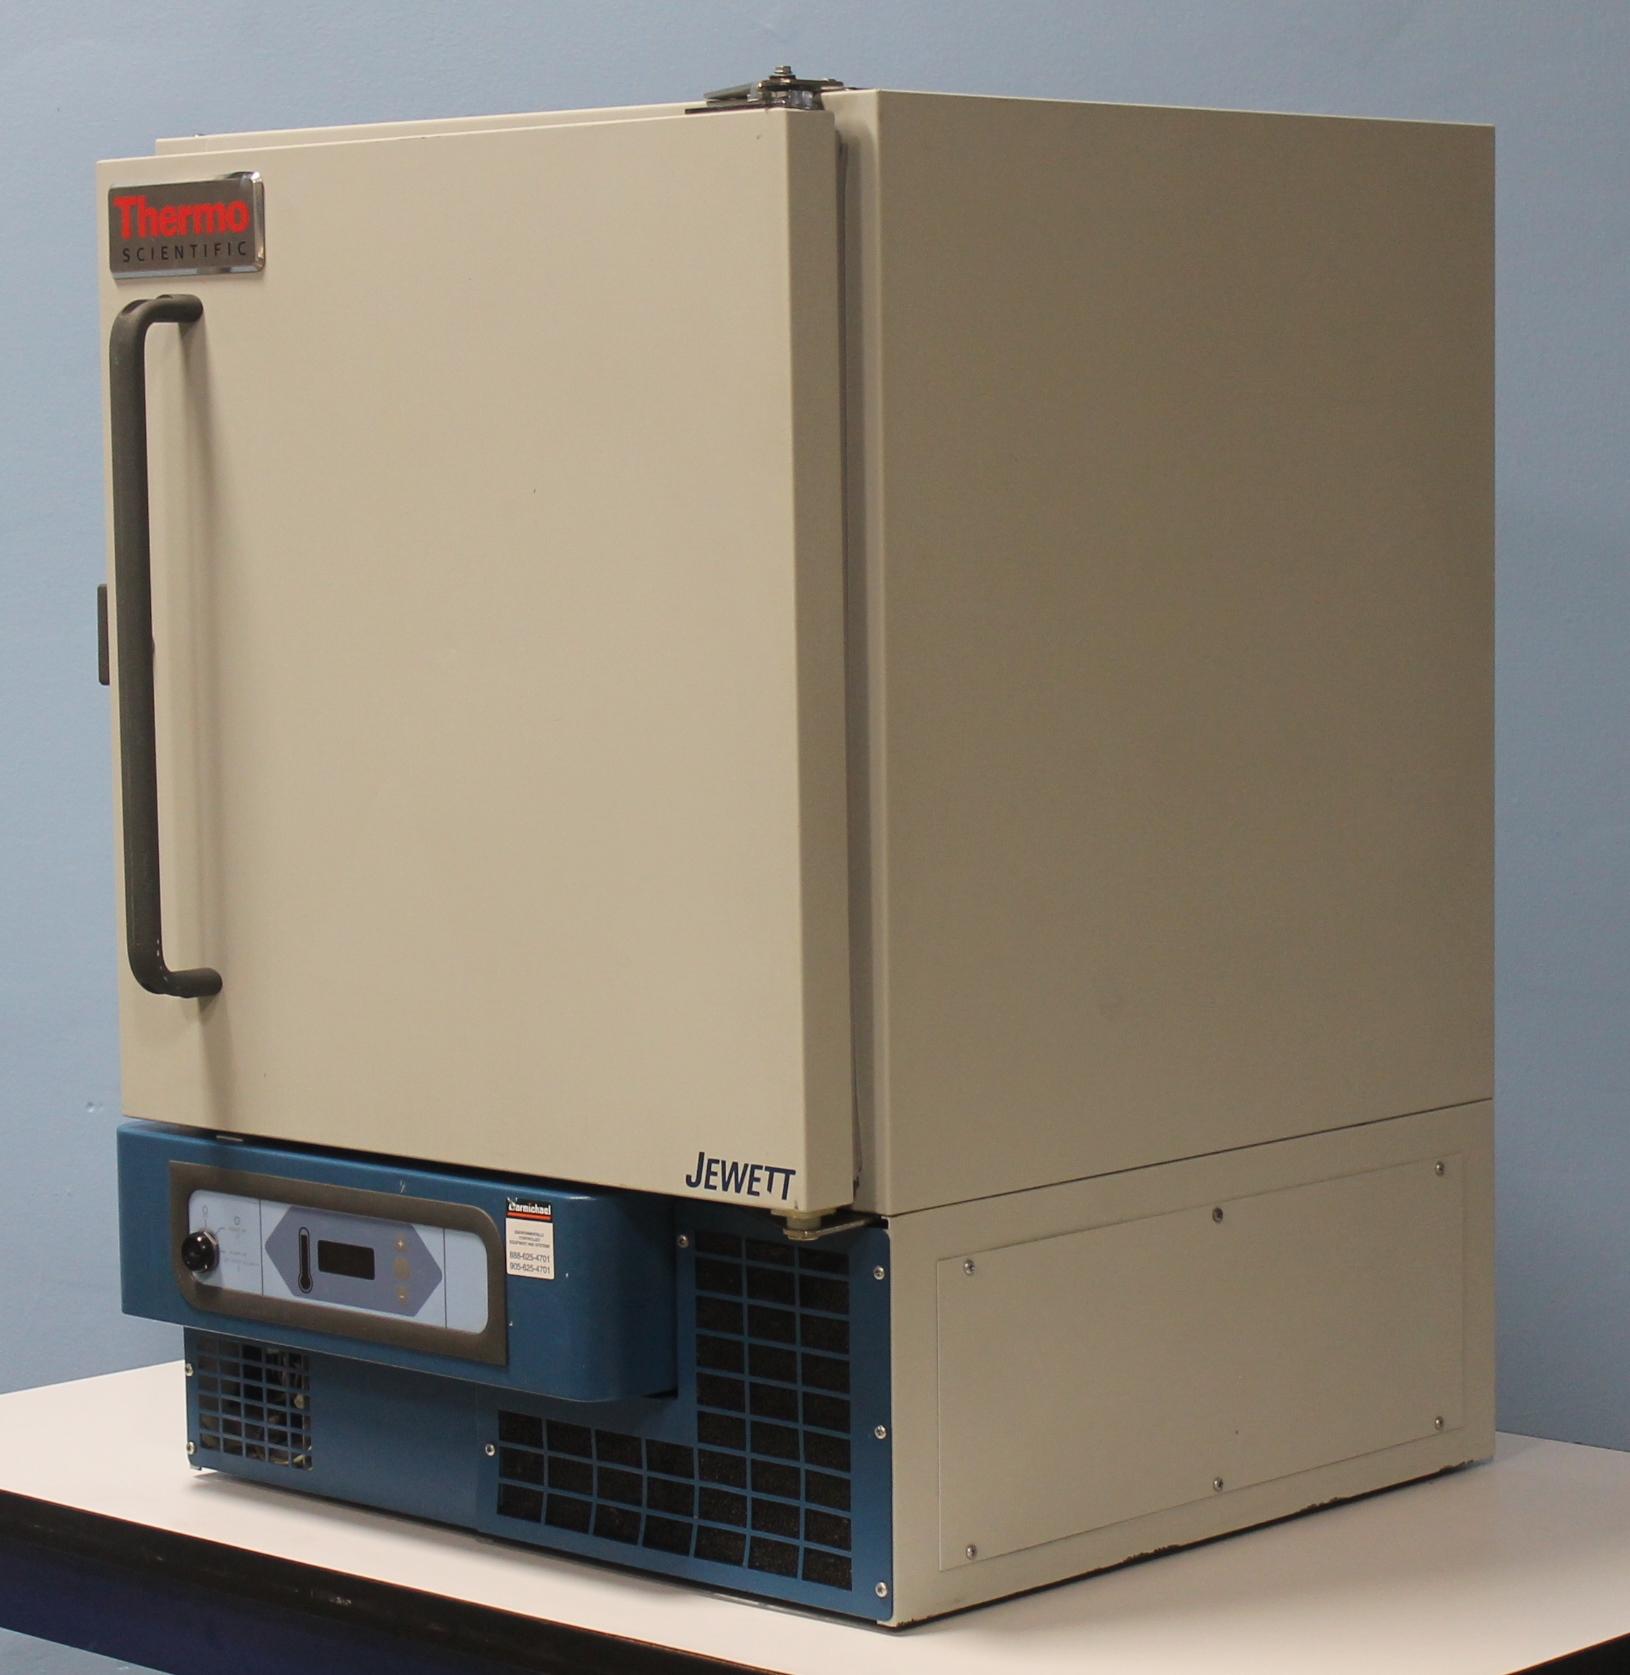 Refurbished Thermo Scientific Jewett High Performance